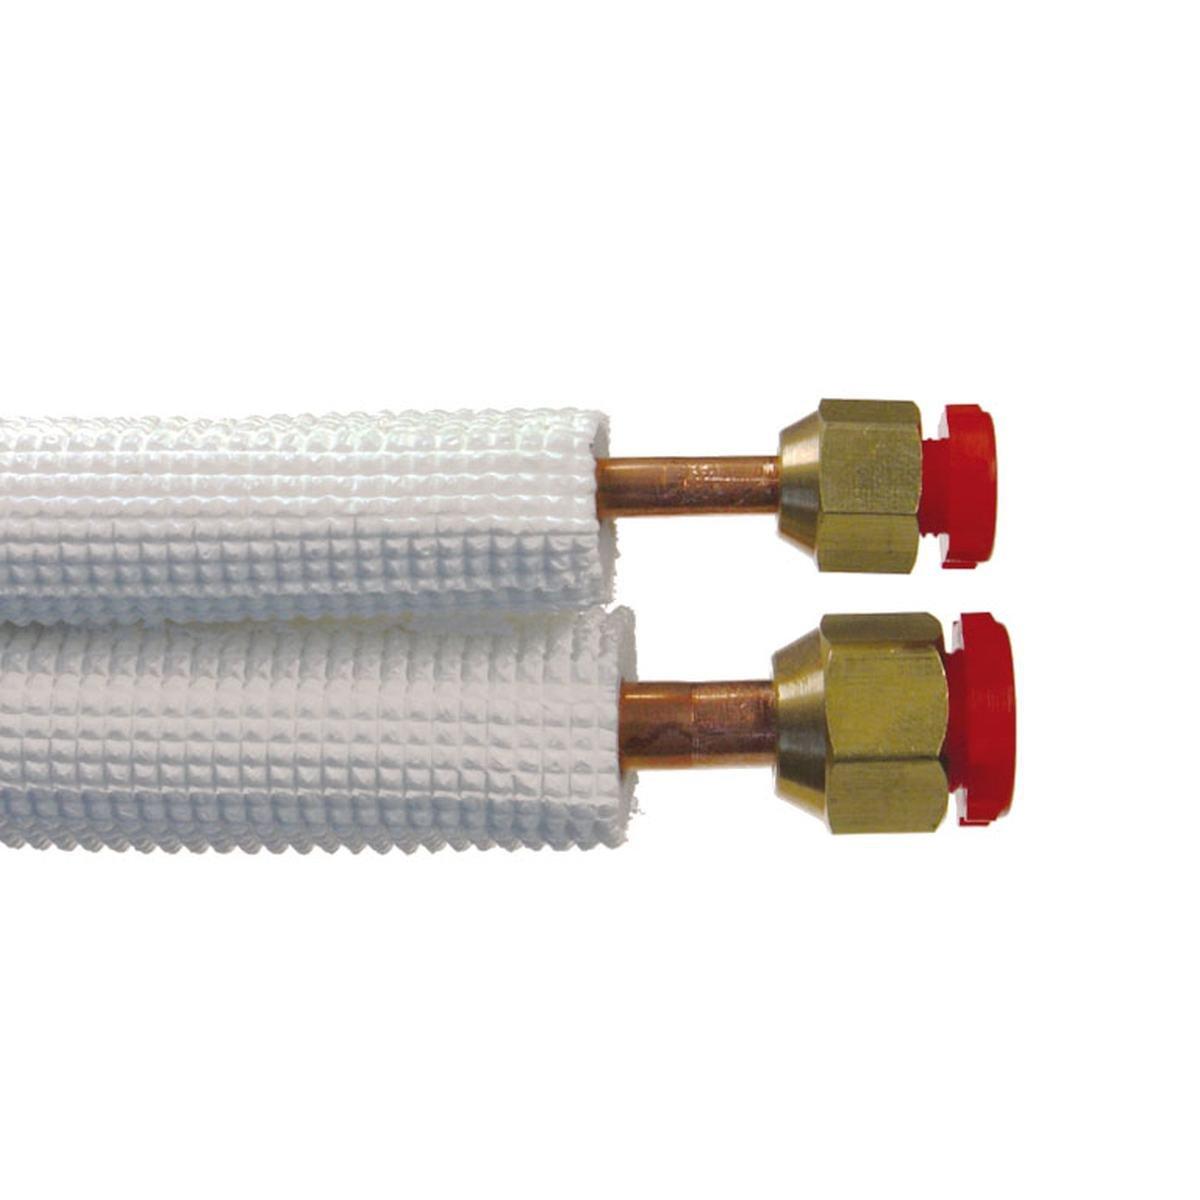 "Kopparrör isolerad dobb. 1/4""+3/8"" x 0,8 mm. 5 met"